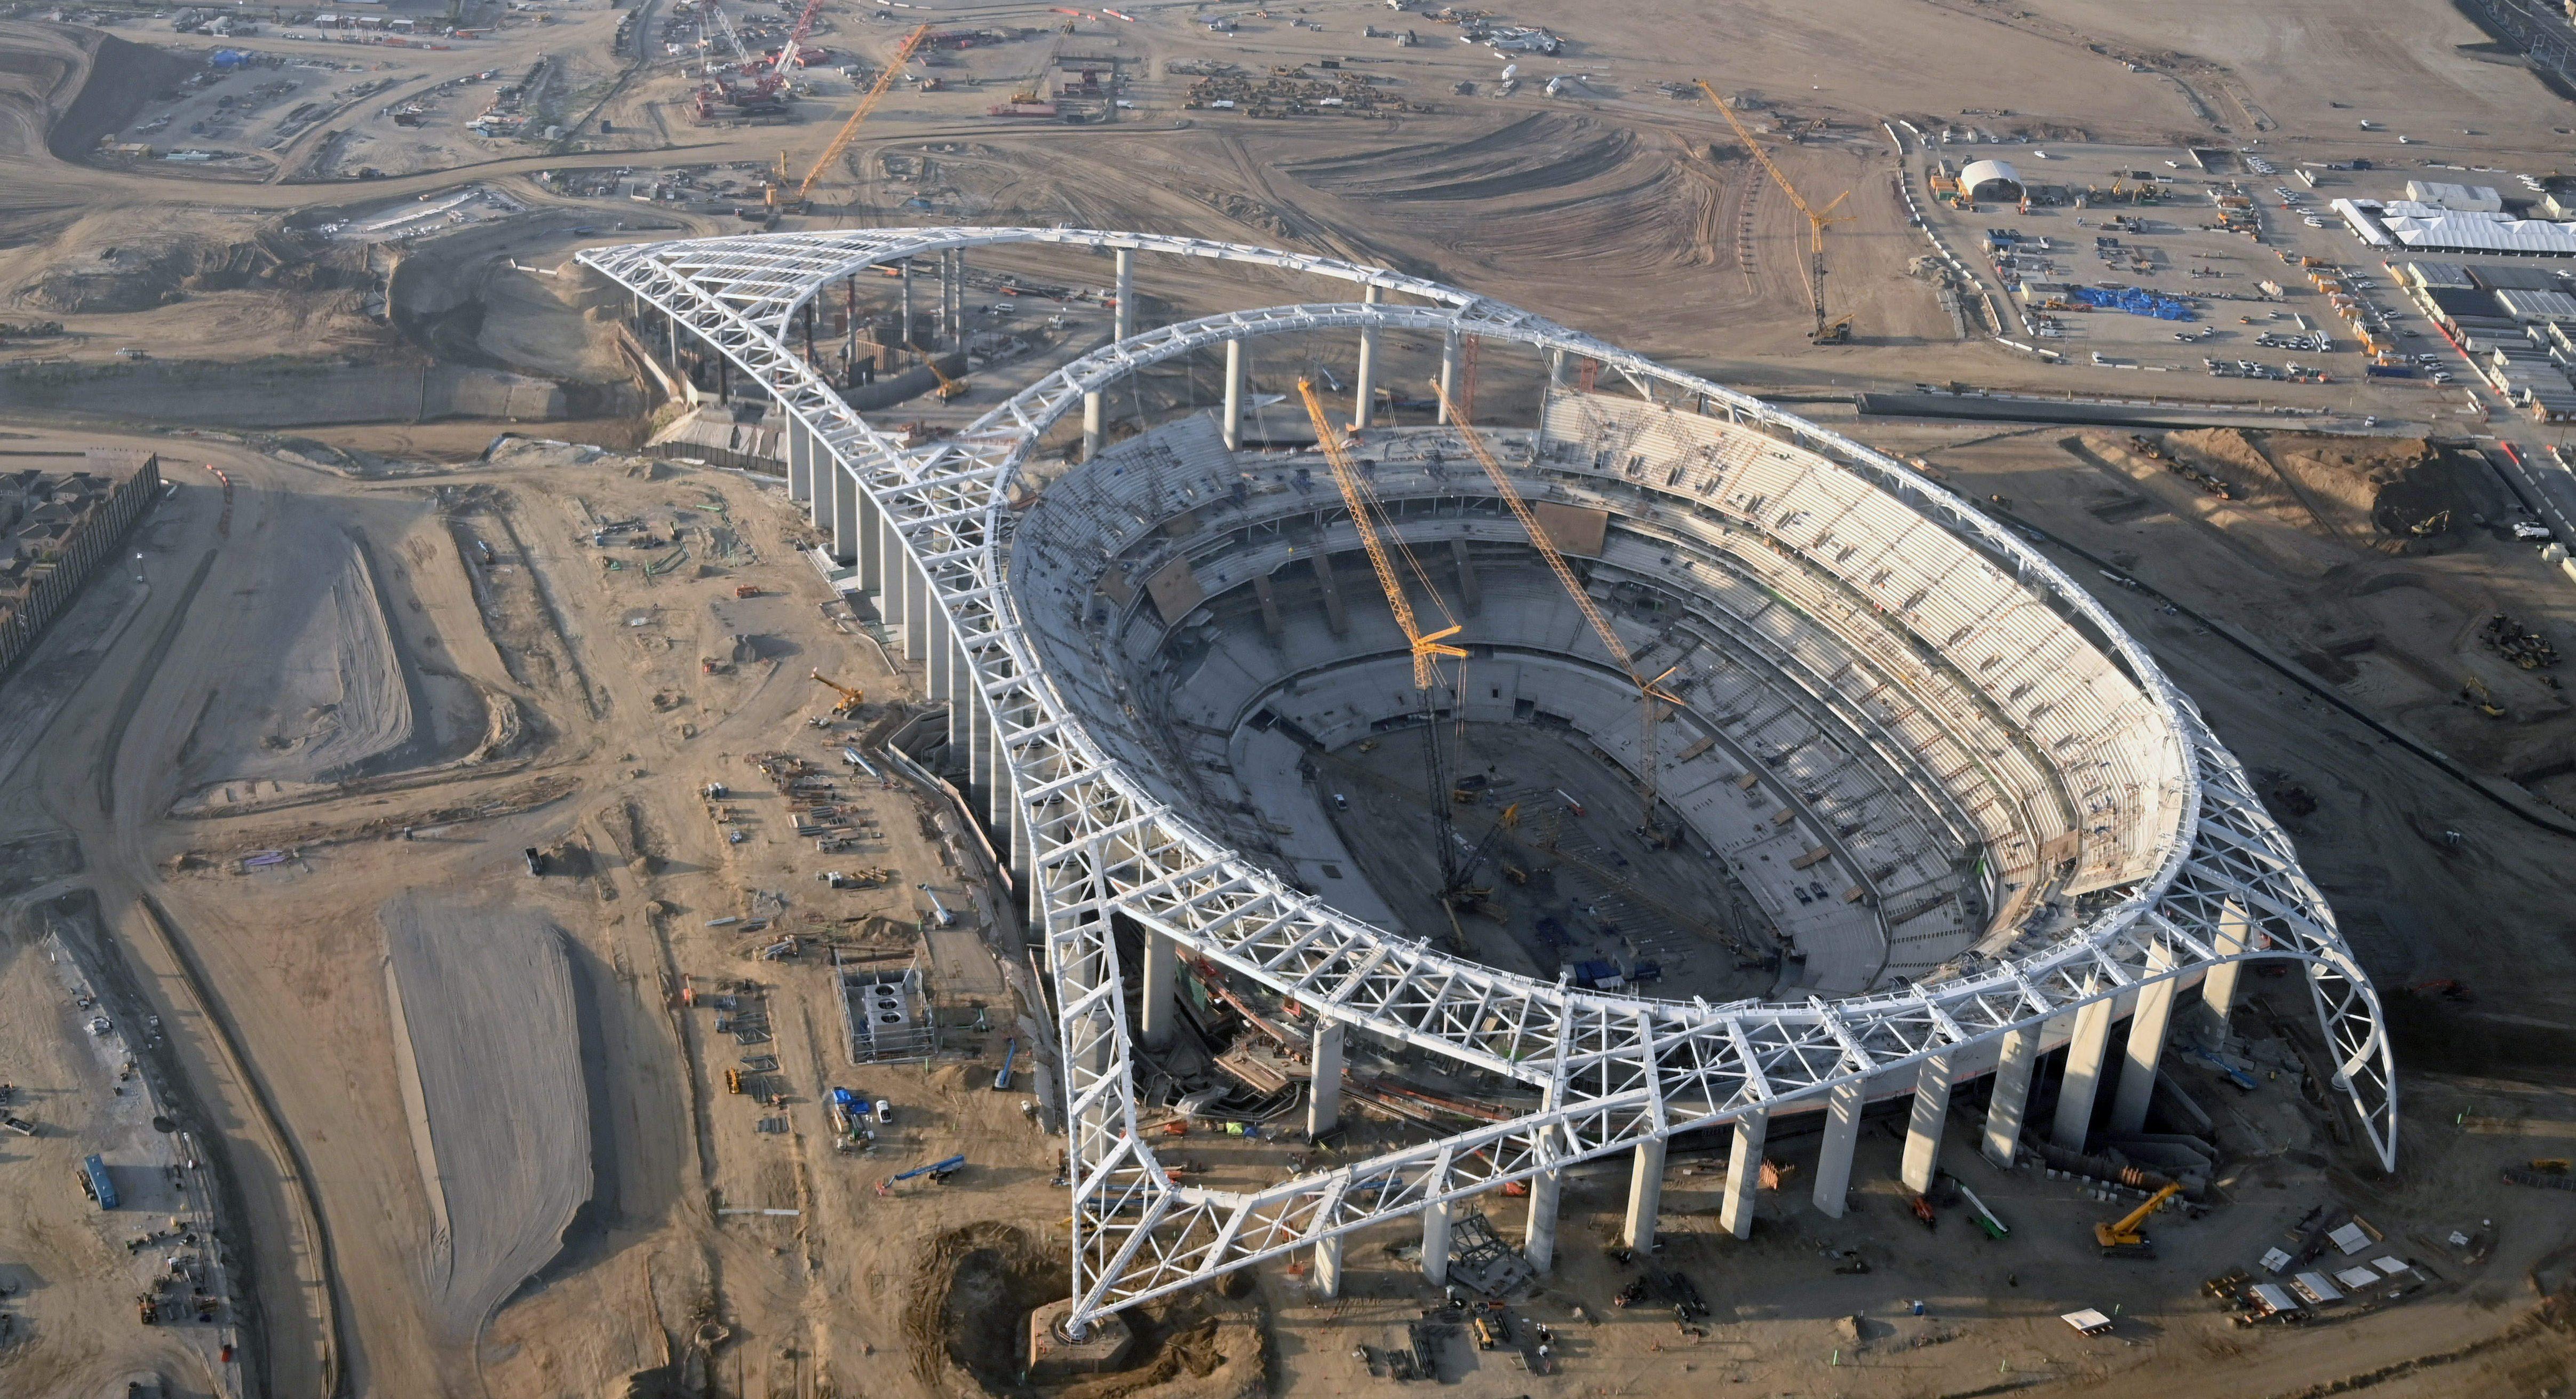 SoFI may spend $400 million on naming LA's new football stadium